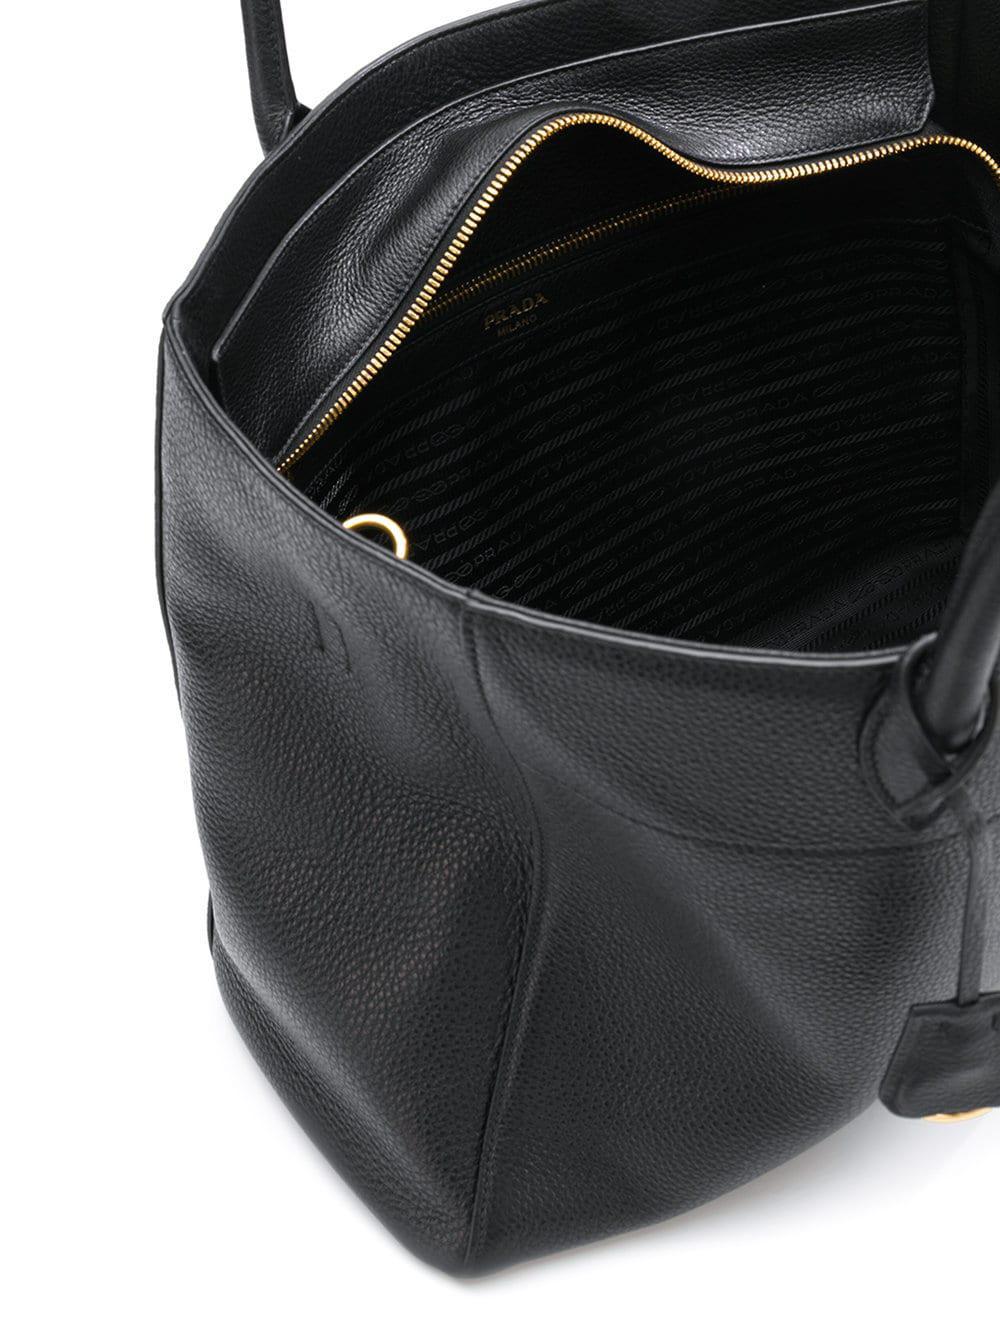 b0ebe6085ad8 sweden prada shoulder jet set 1255 handbags in black f504f 7dd36